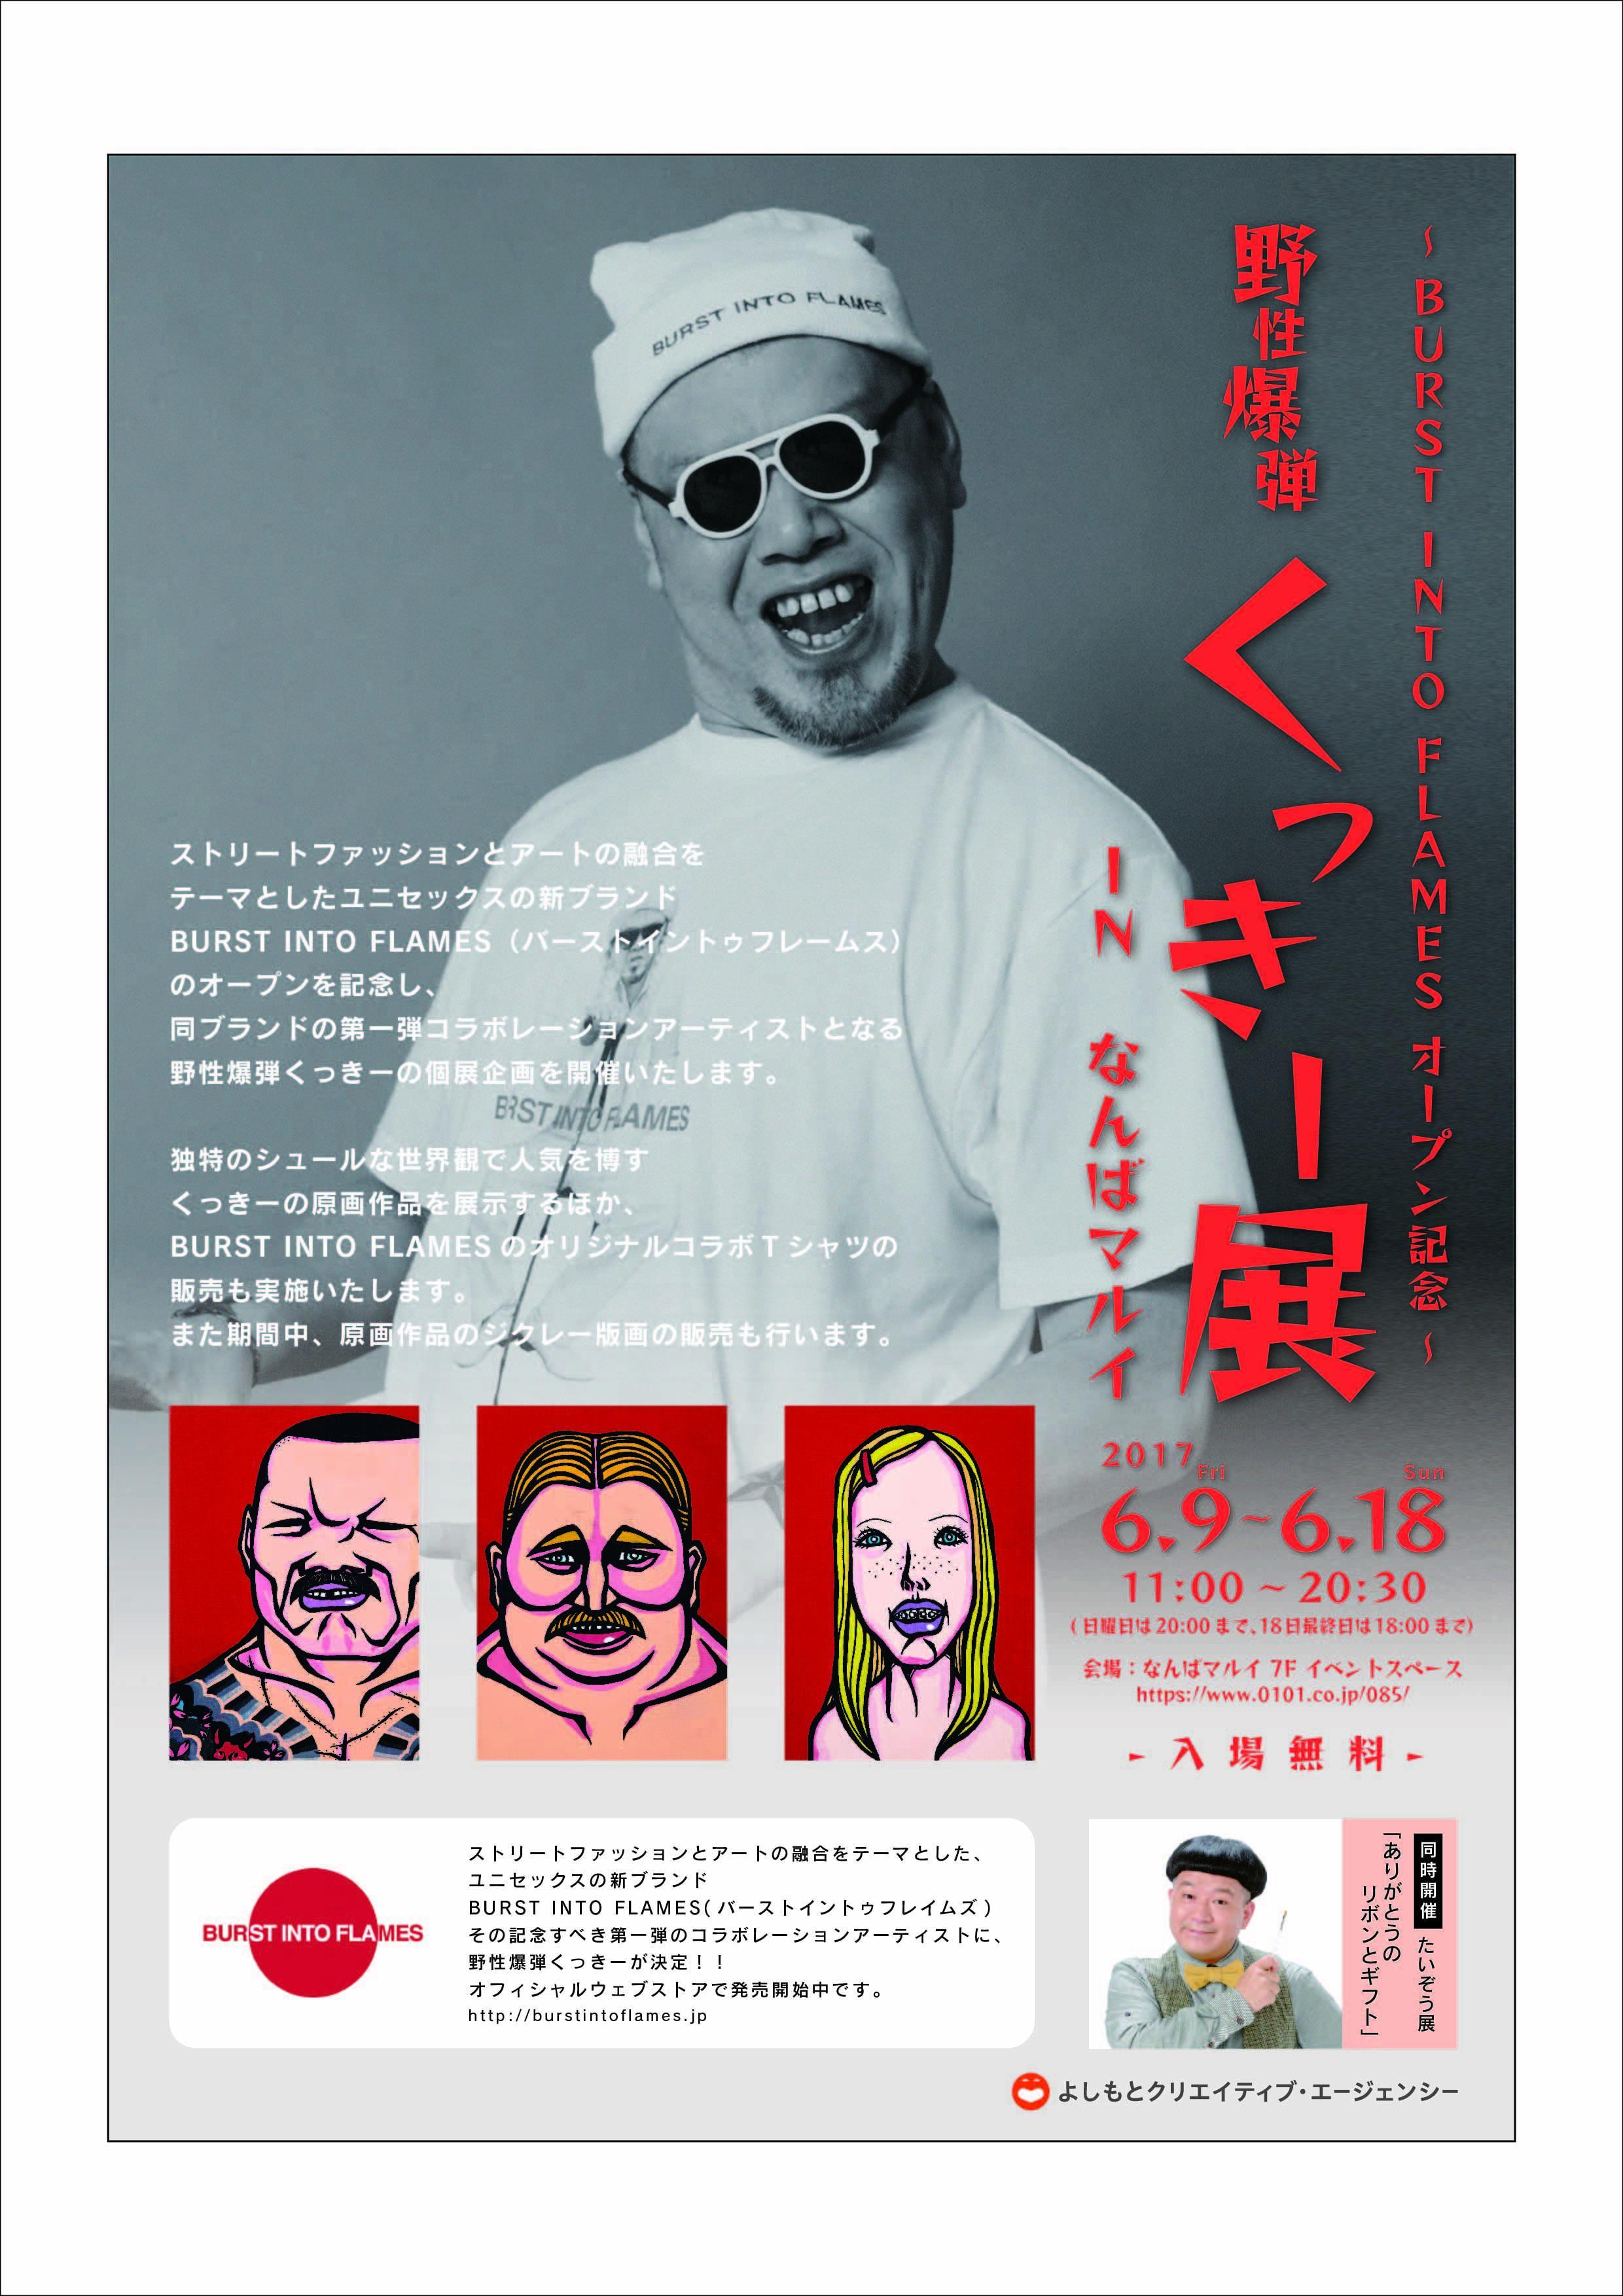 http://news.yoshimoto.co.jp/20170608100546-60bf670dec347eff98160a46843c4bdf8ef909f9.jpg